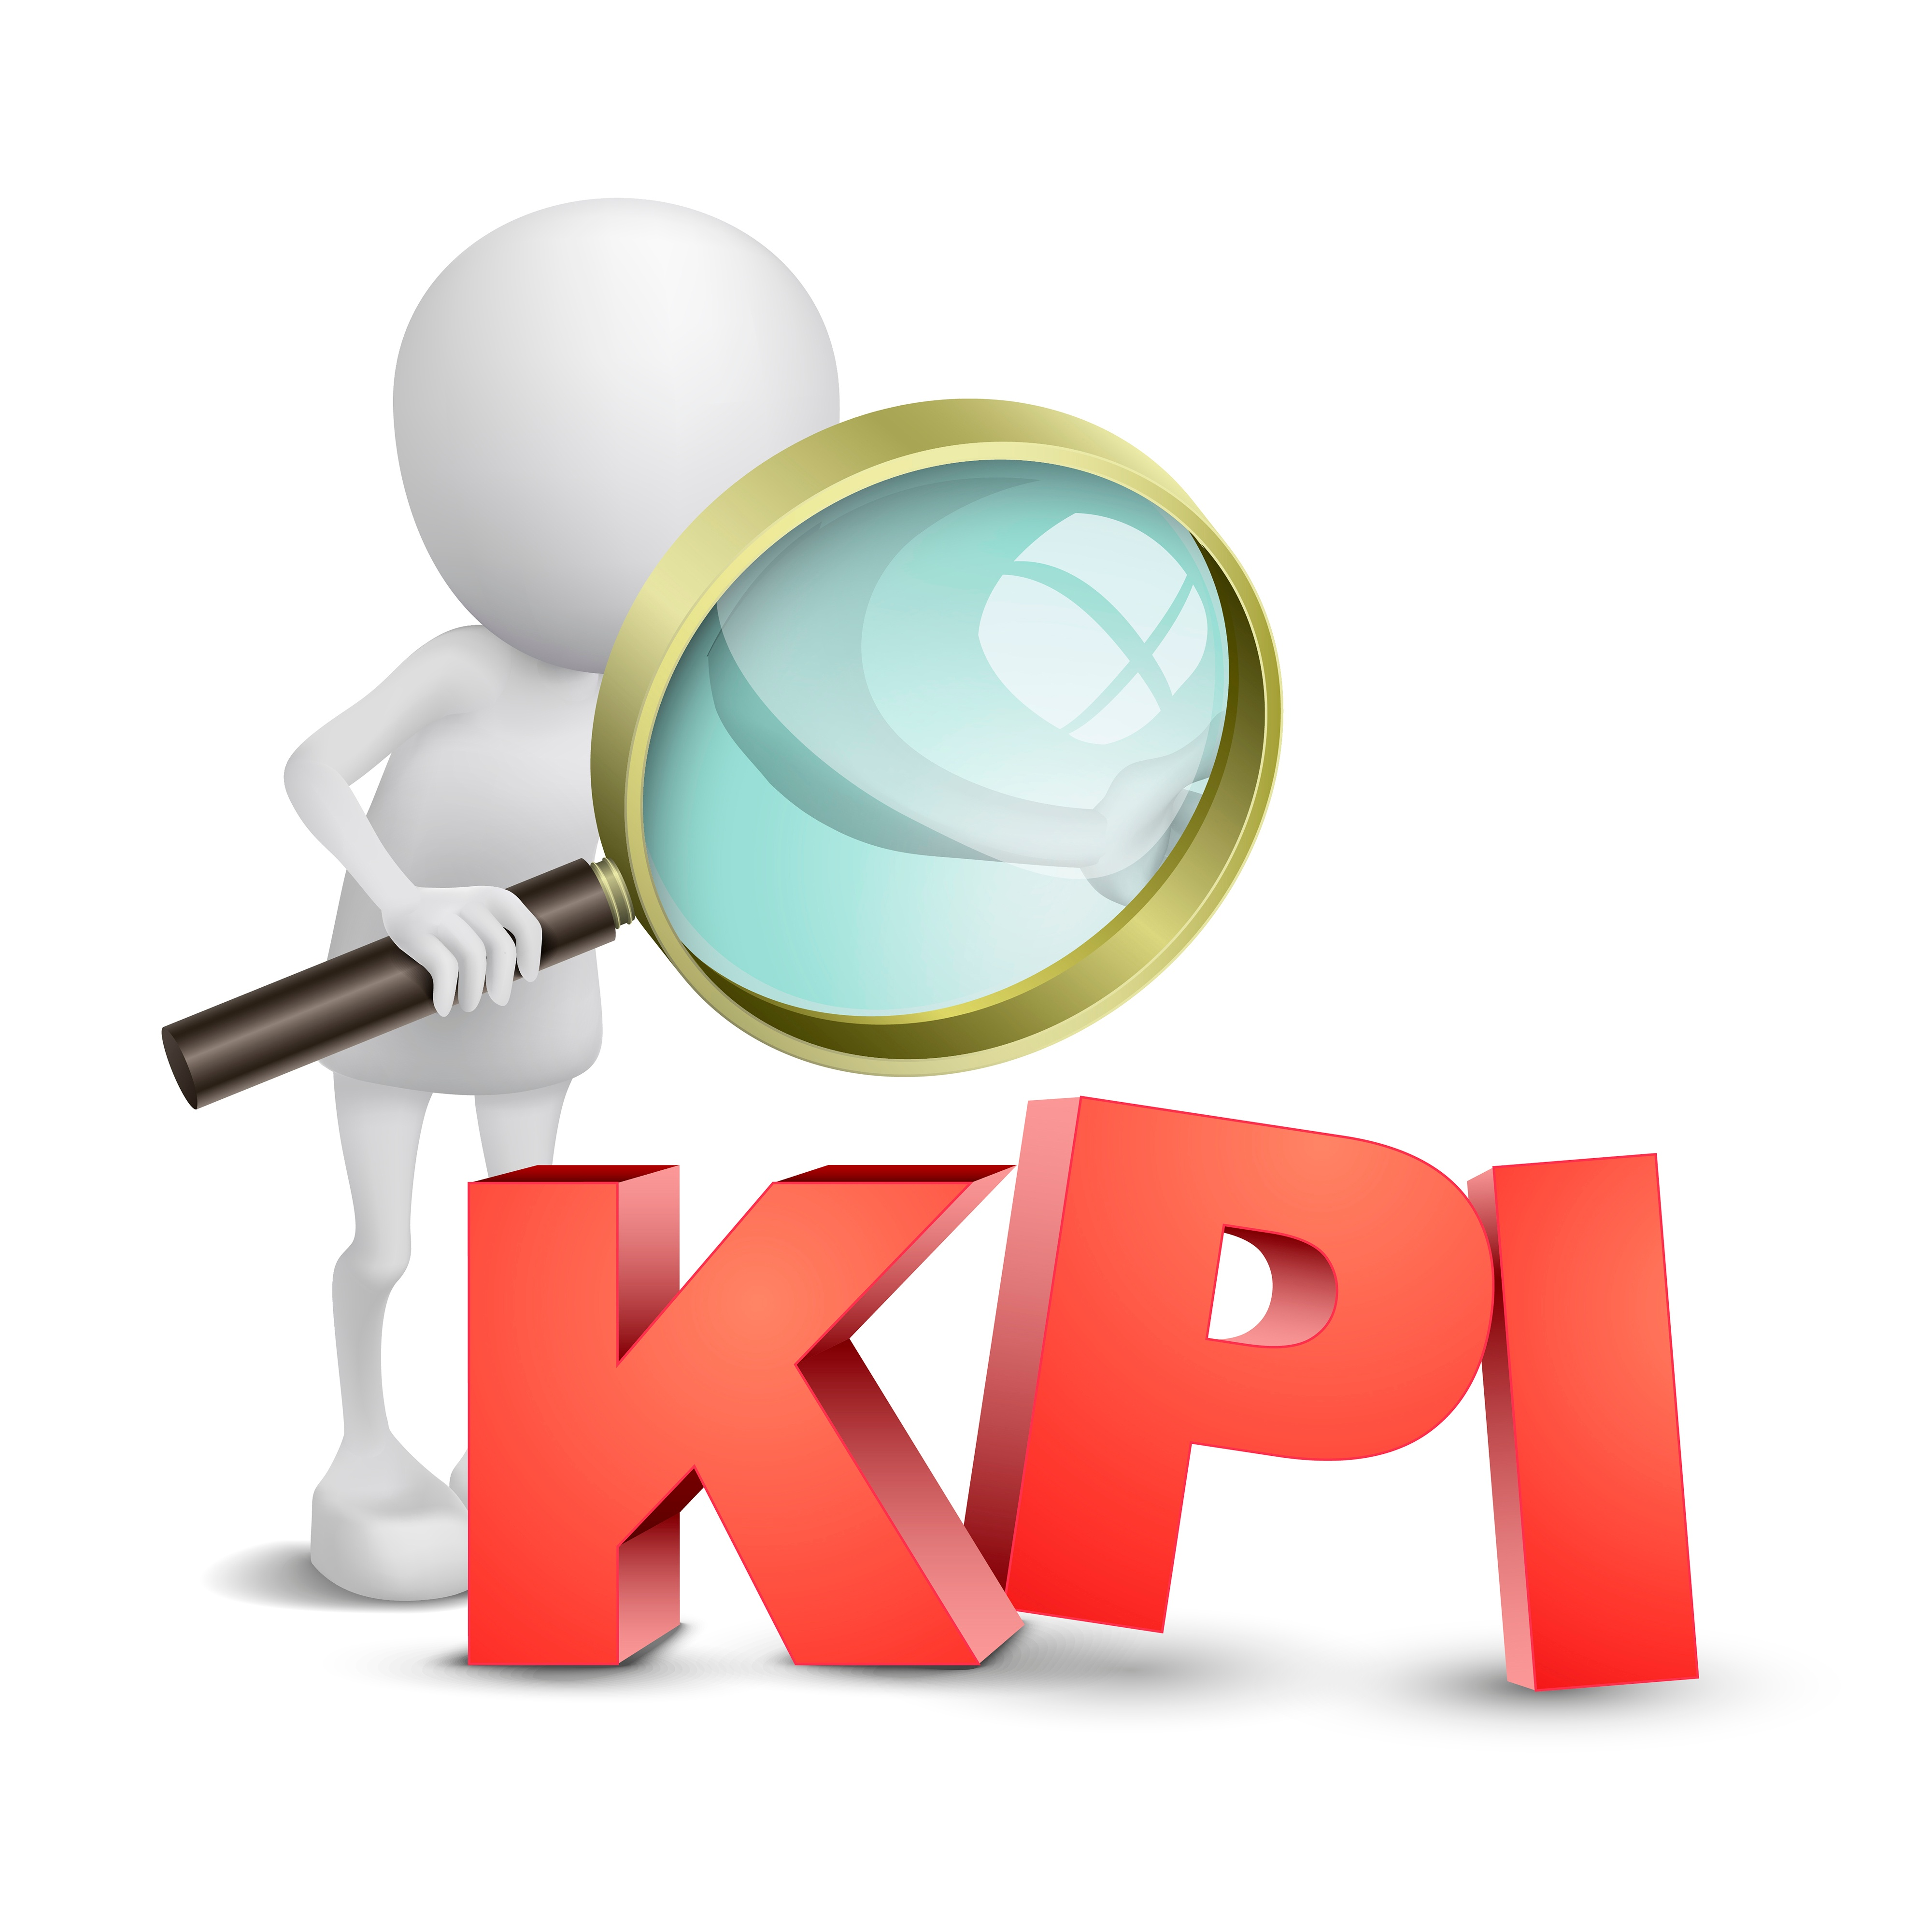 KPI-key-performance-indicators.jpg